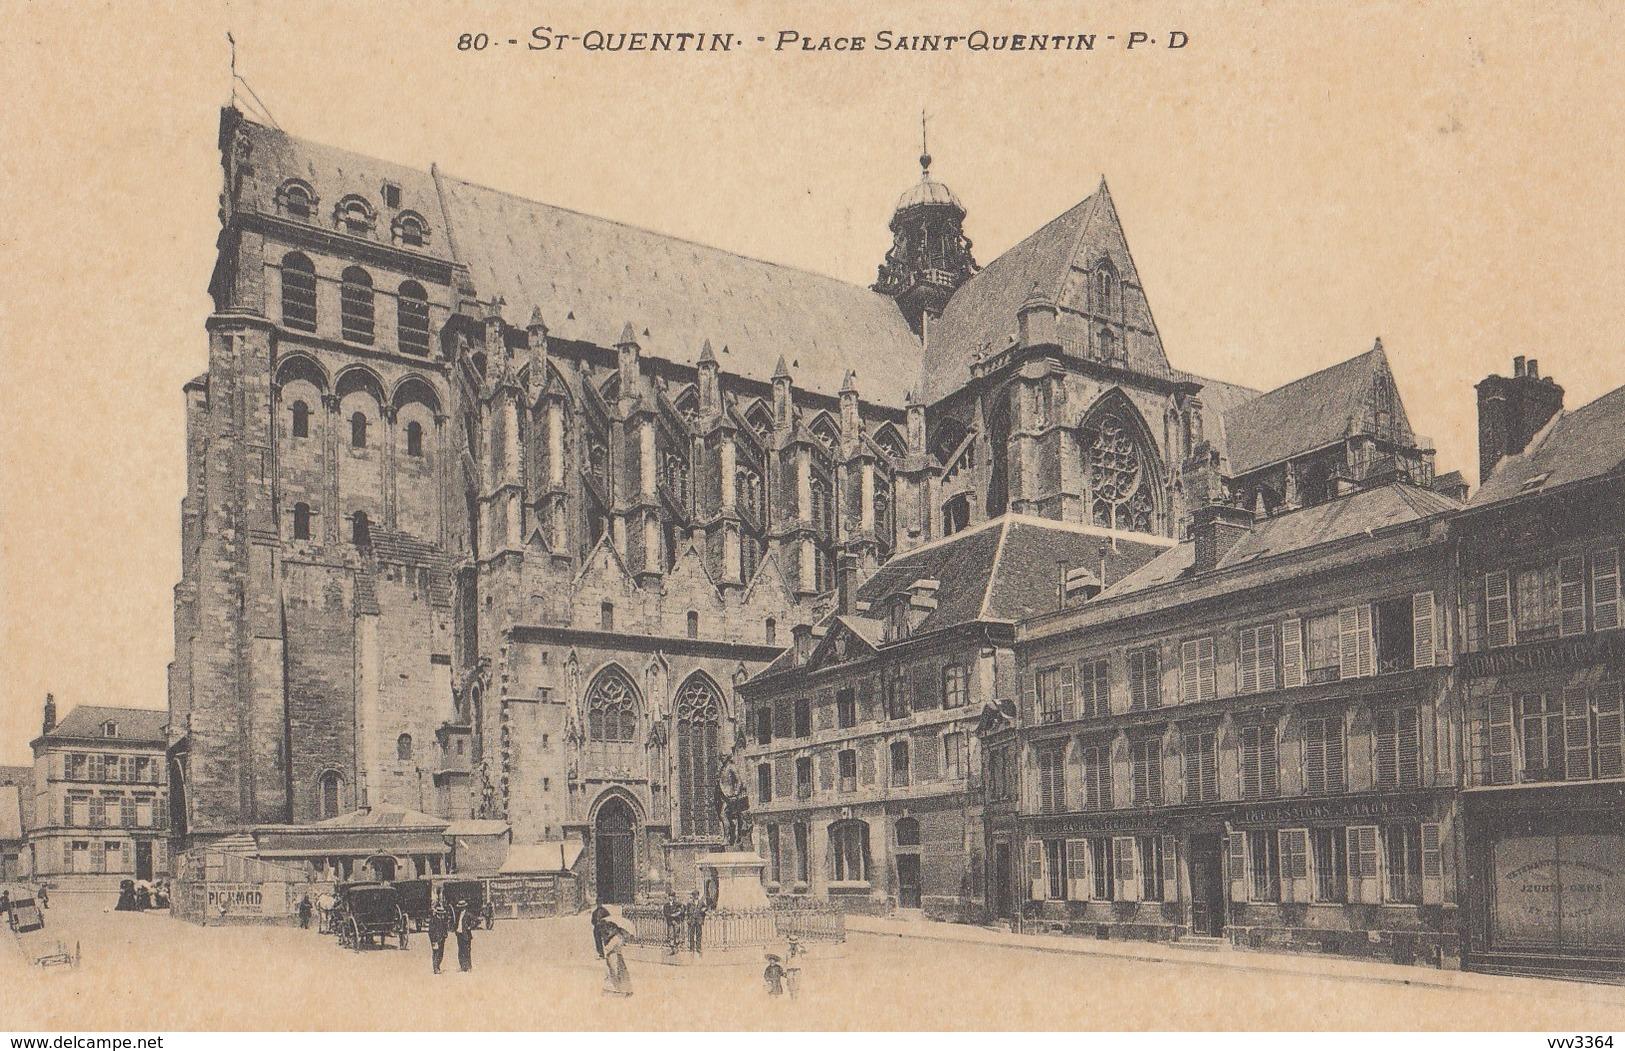 SAINT-QUENTIN: Place Saint-Quentin - Saint Quentin